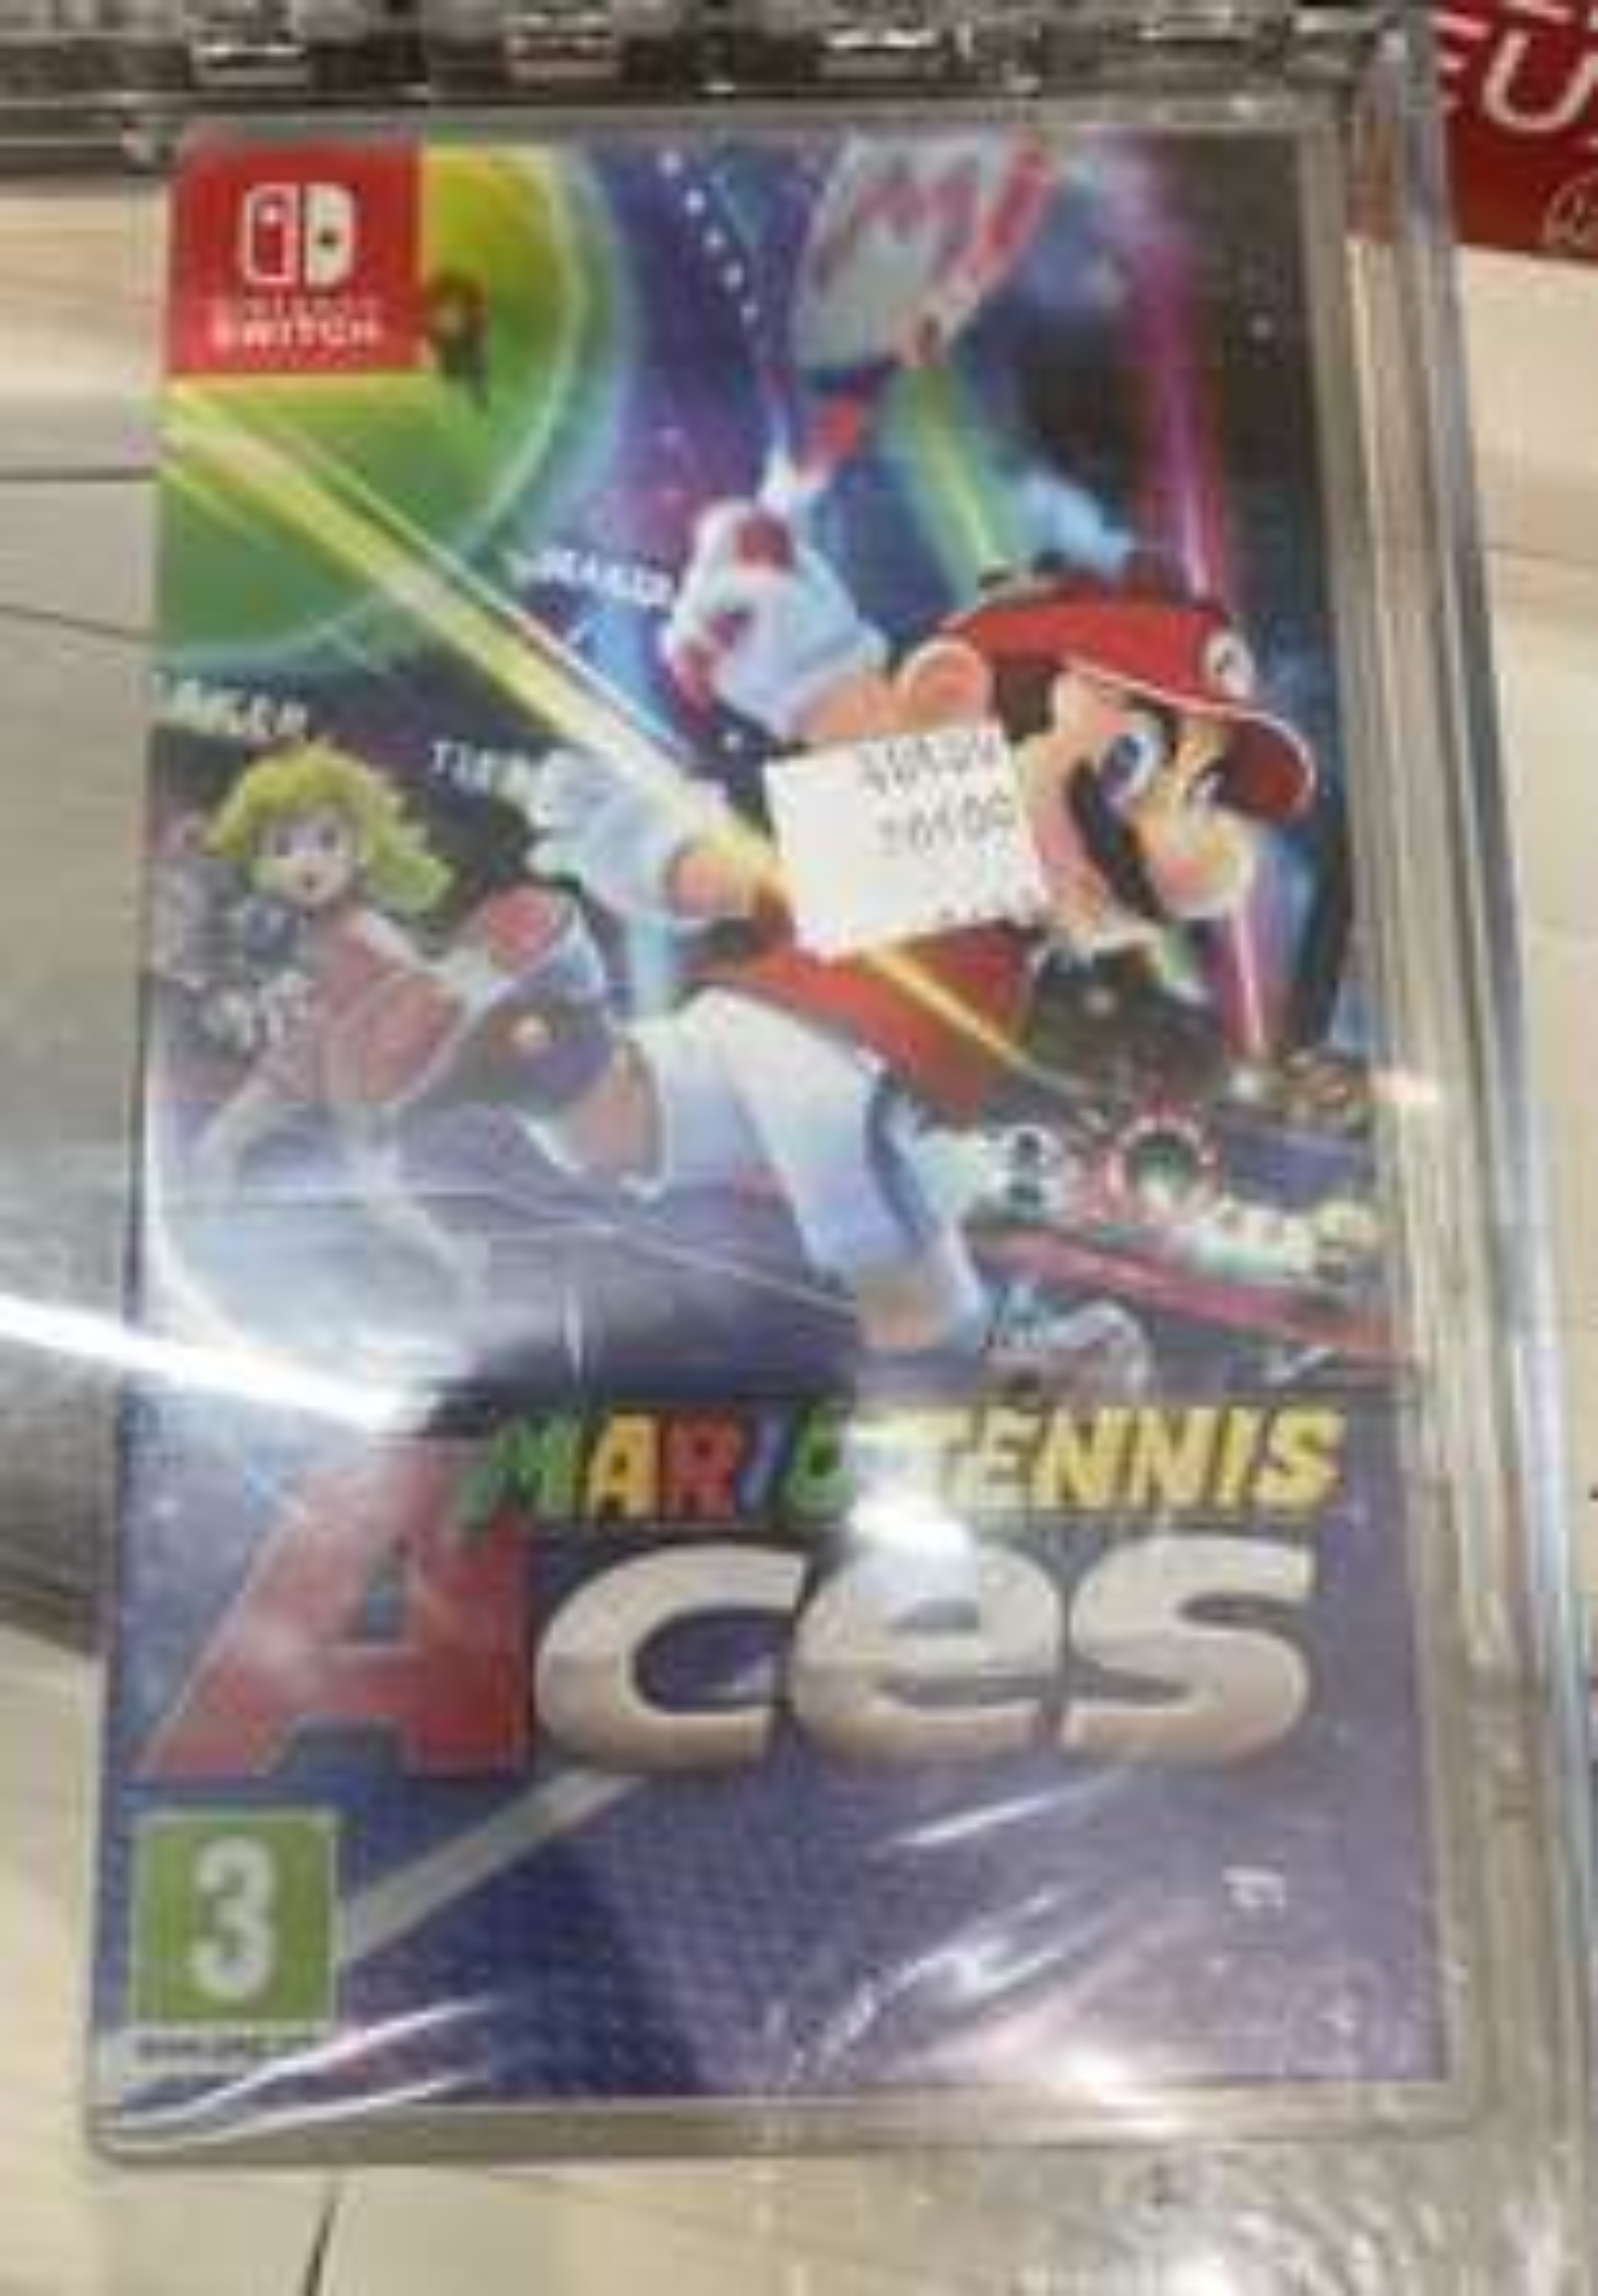 Mario Tennis Ace sur Nintendo Switch - Sens (89)